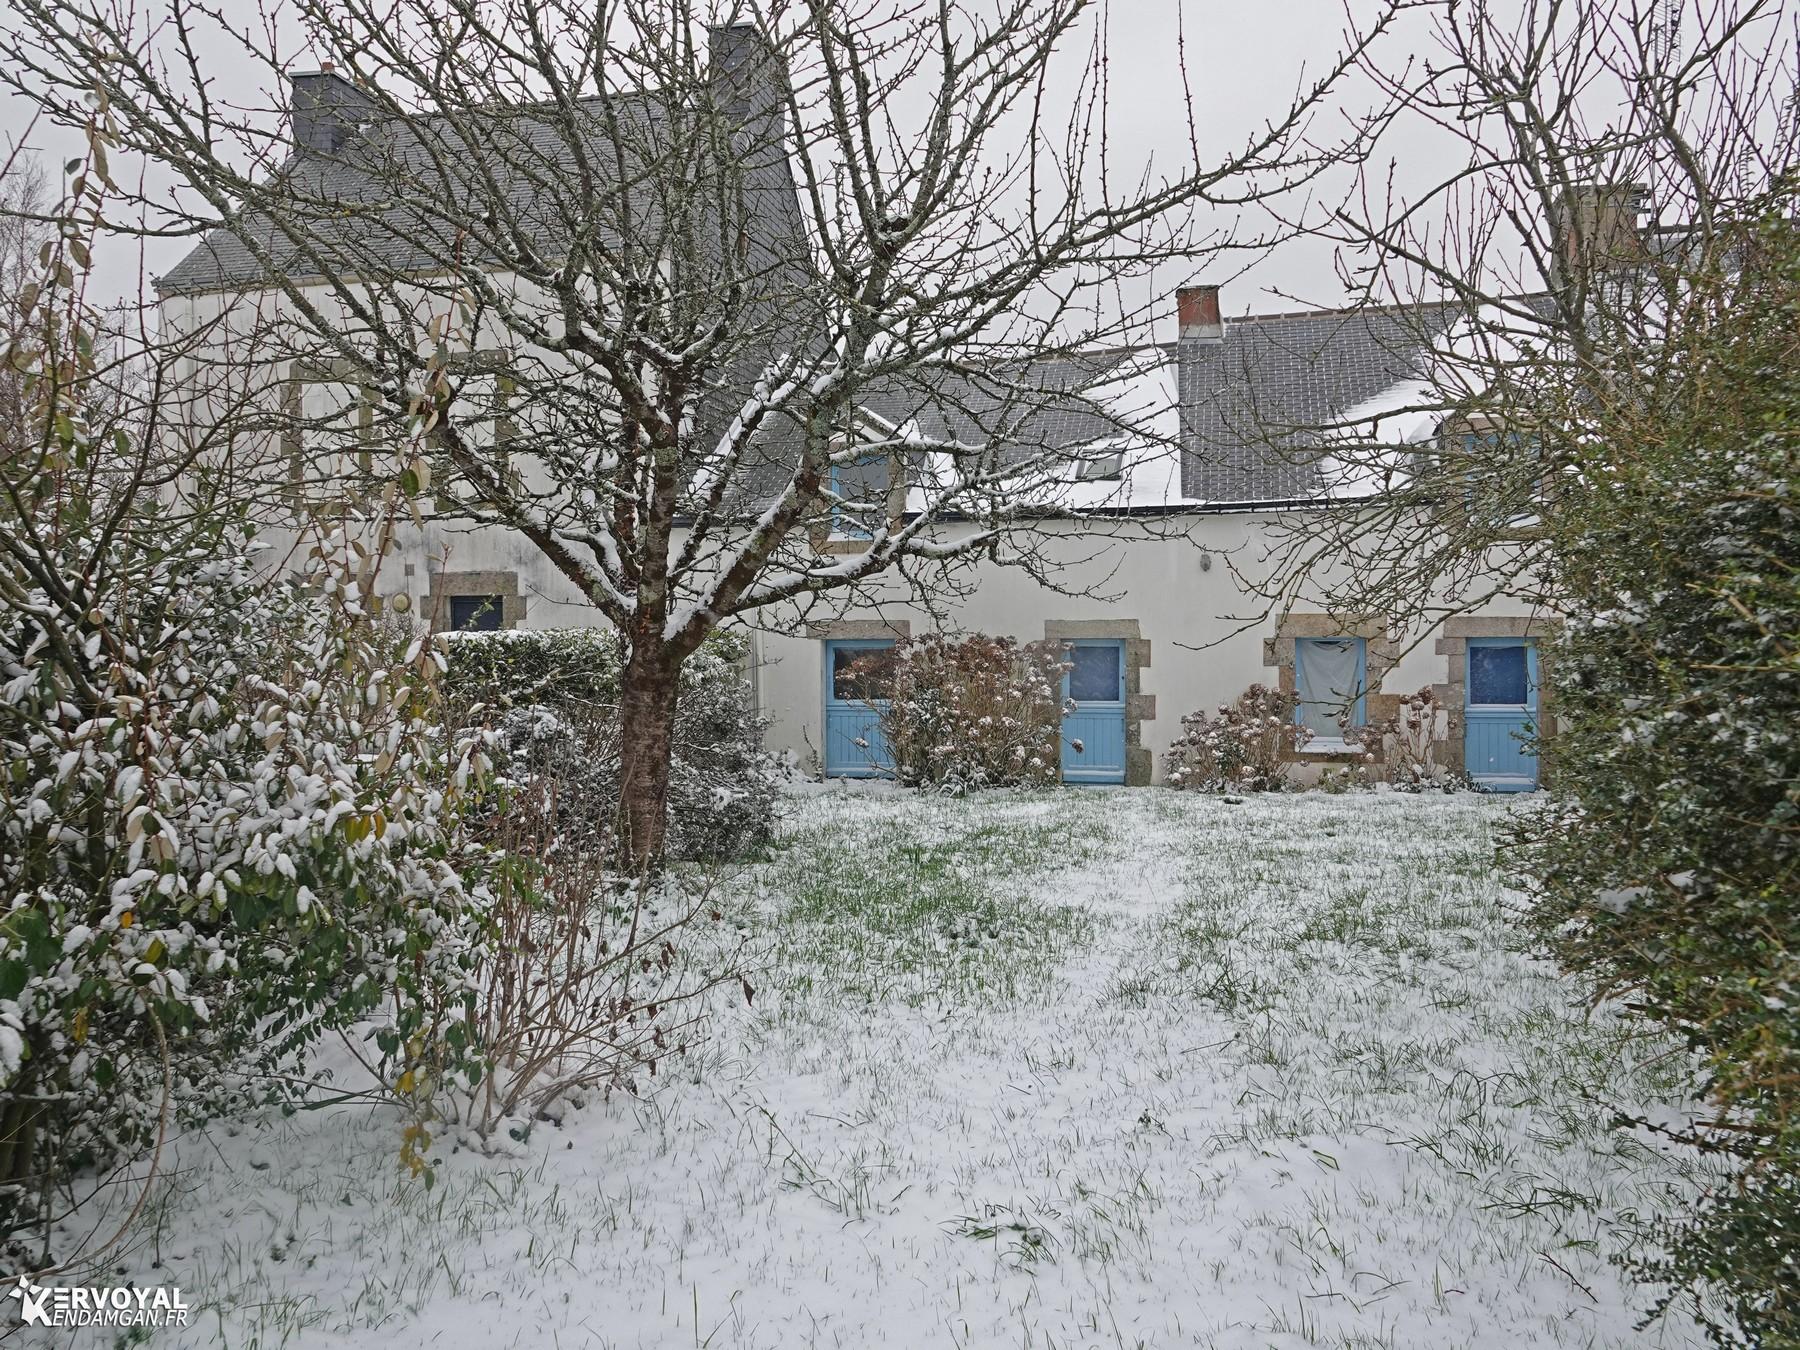 neige à kervoyal 11 février 2021 damgan morbihan (16)